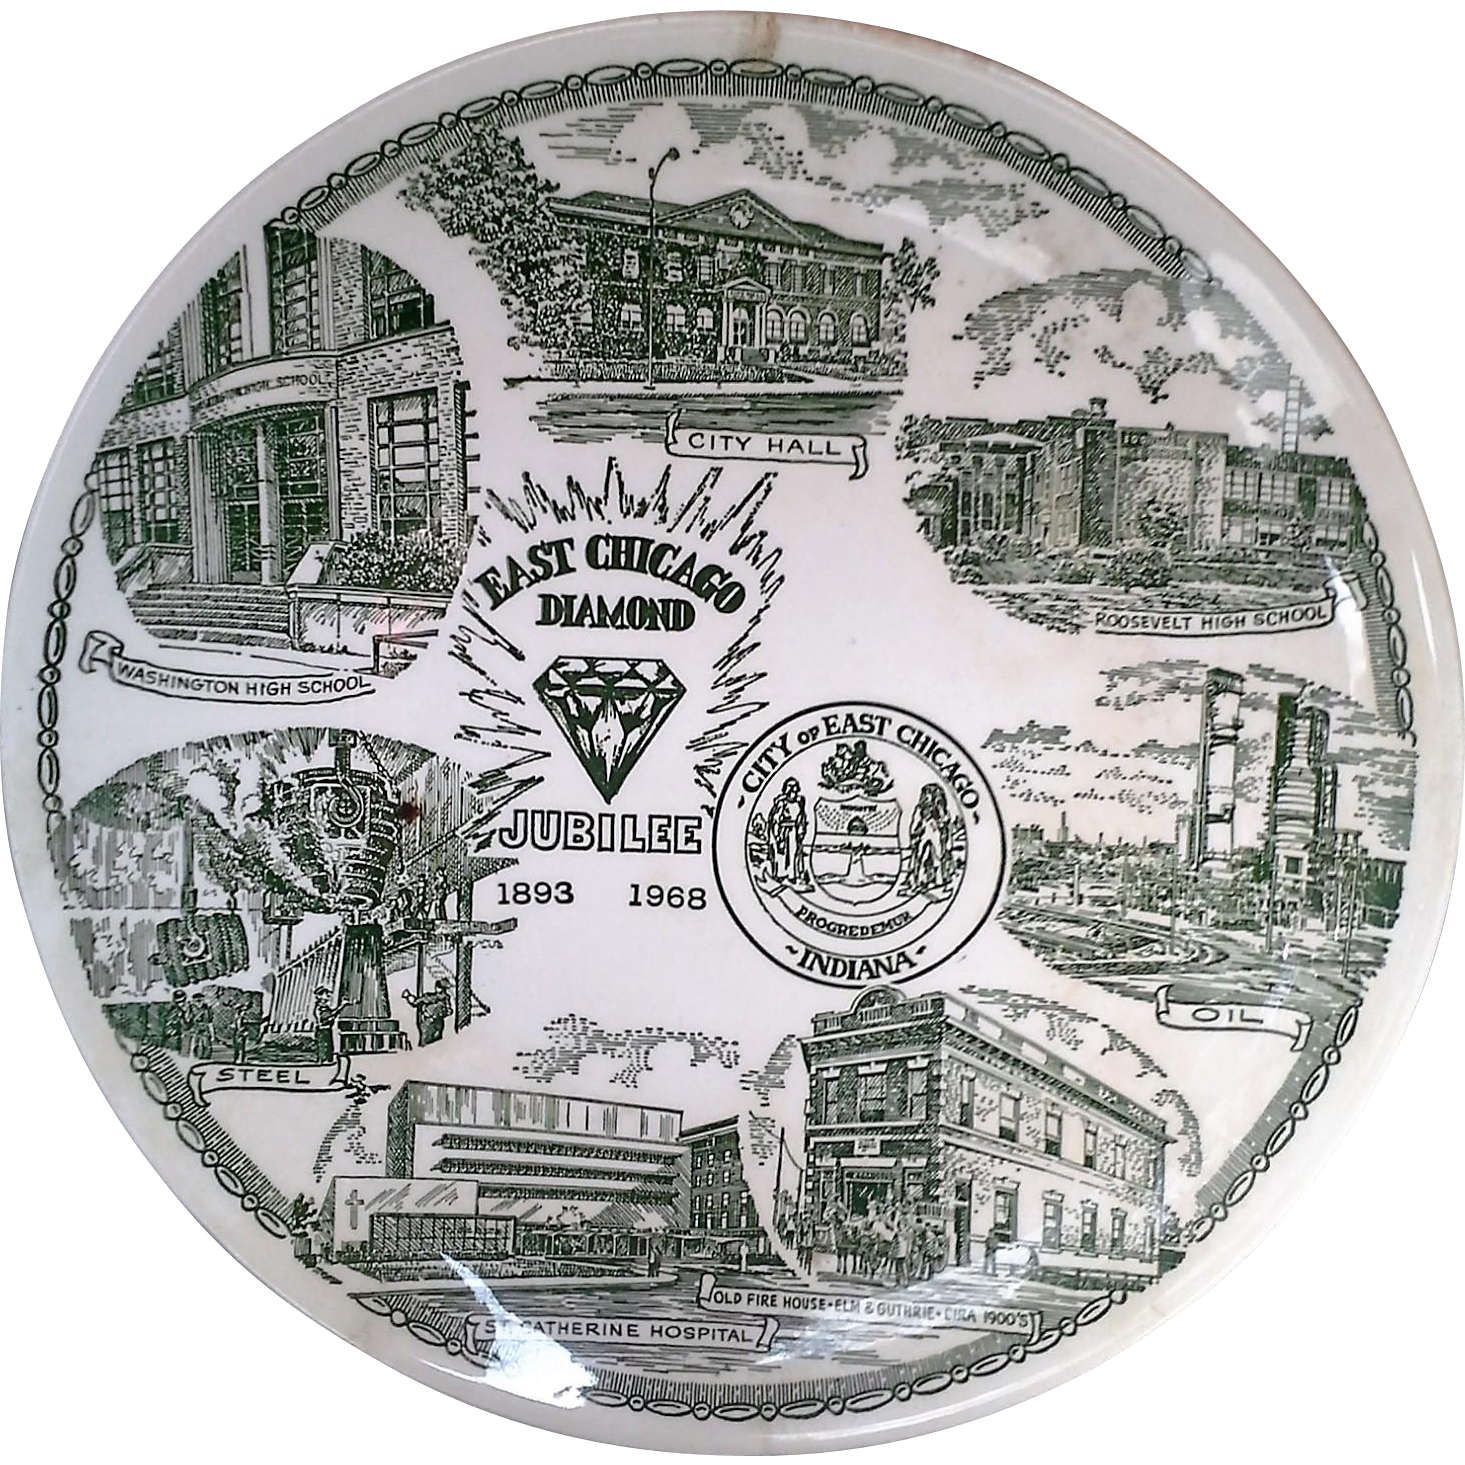 East Chicago Diamond Jubilee Green Transferware Souvenir Plate 1968 Kettlesprings Kilns